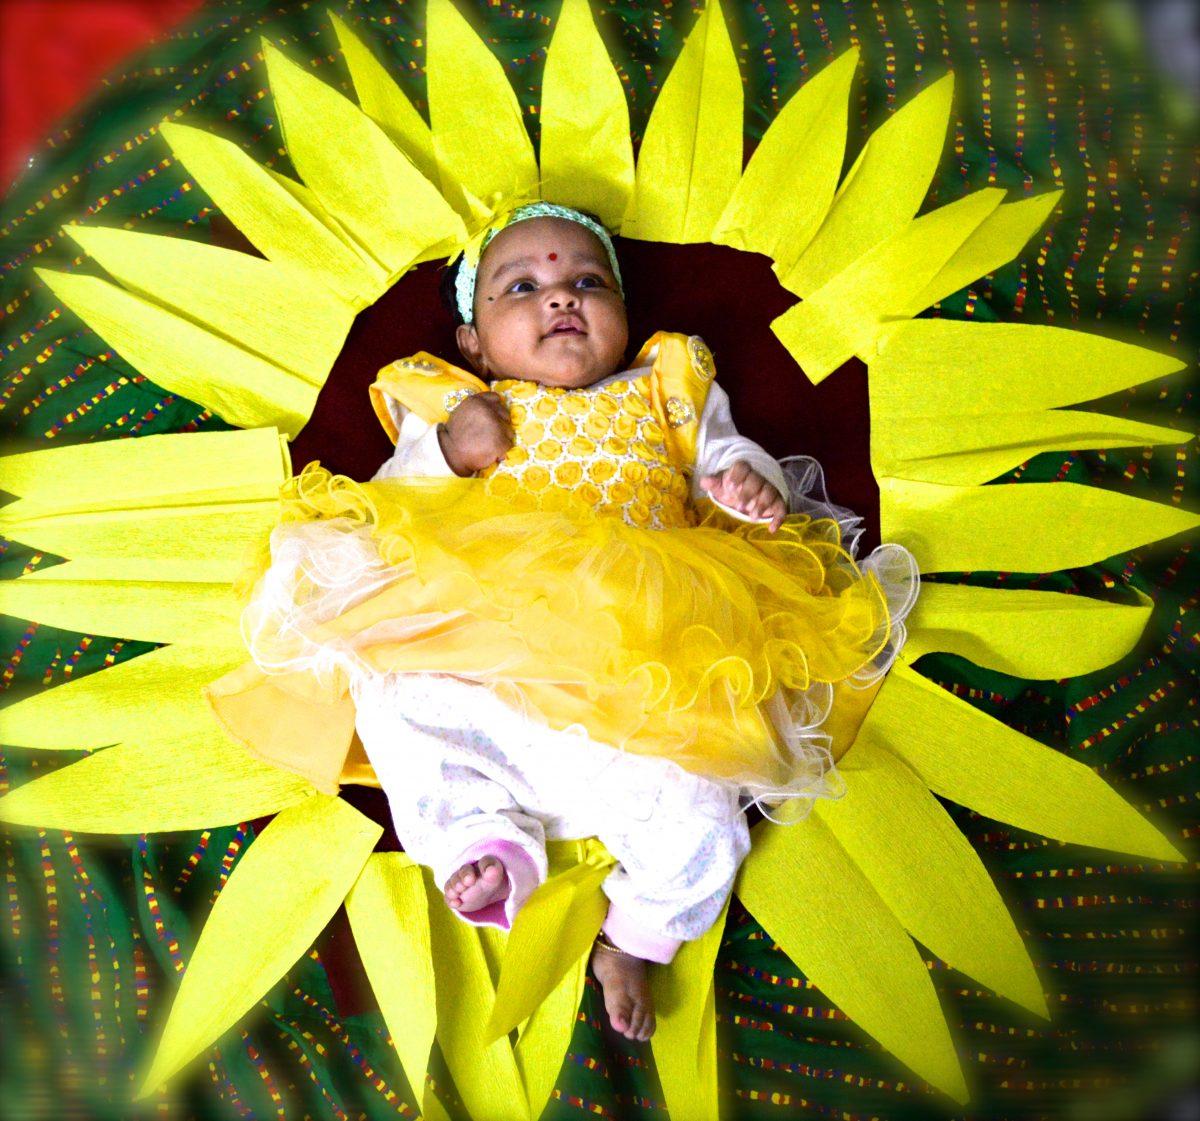 Kids Photoshoot Props 2 : Sunflower